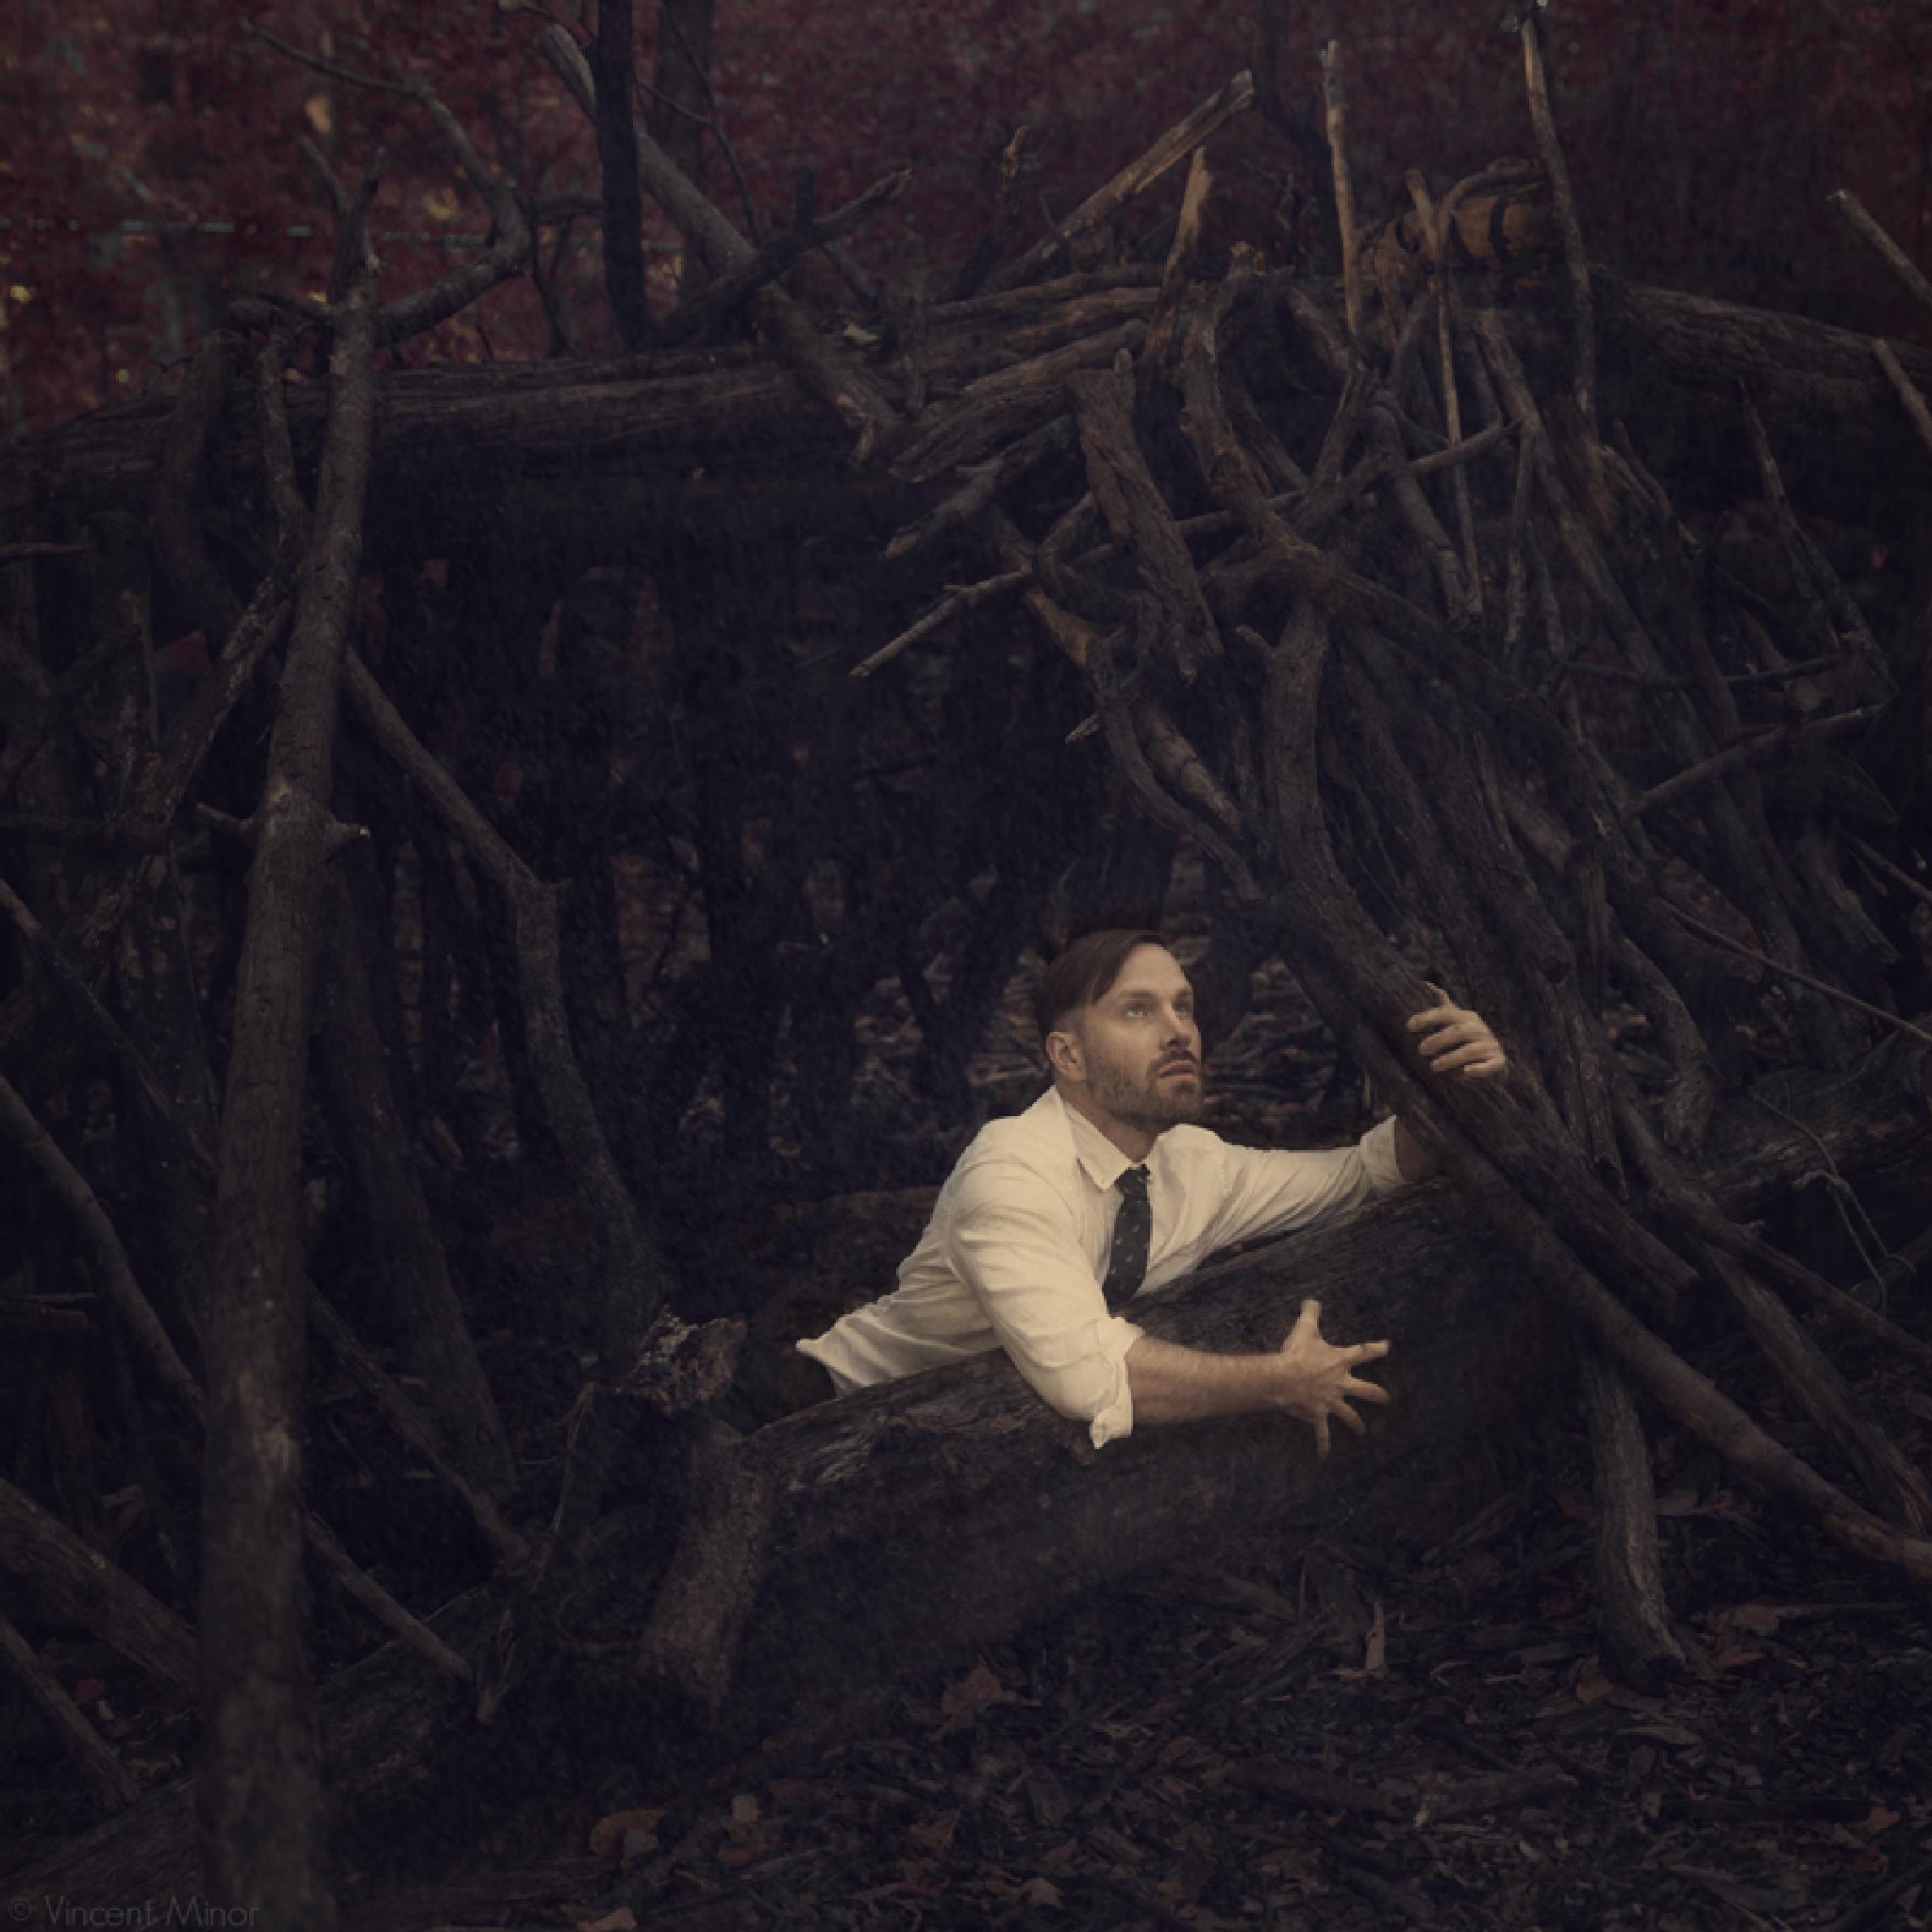 House Of Sticks by vincentminor